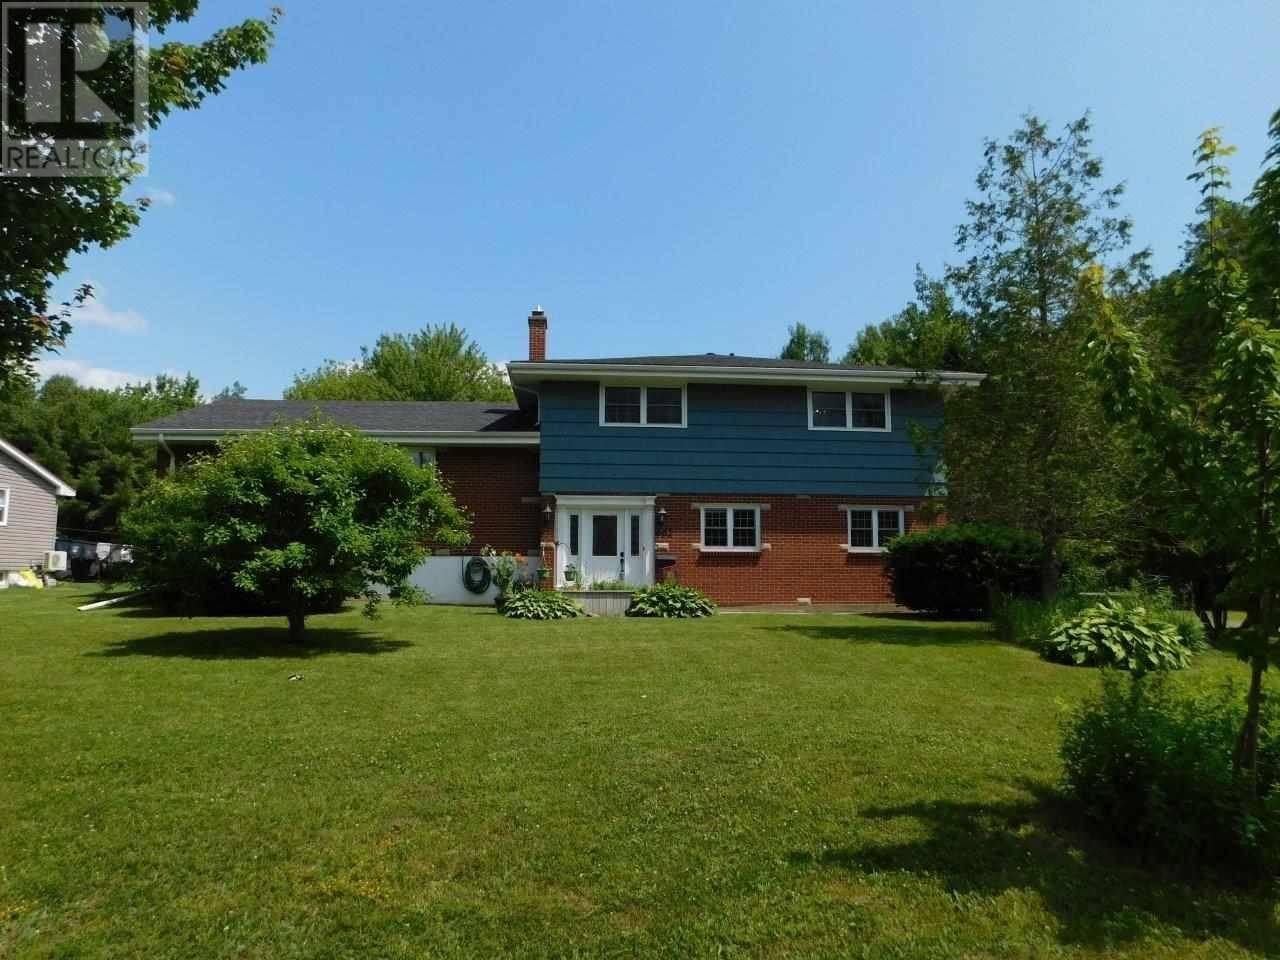 House for sale at 462 Waverley Rd Waverley Nova Scotia - MLS: 201918173